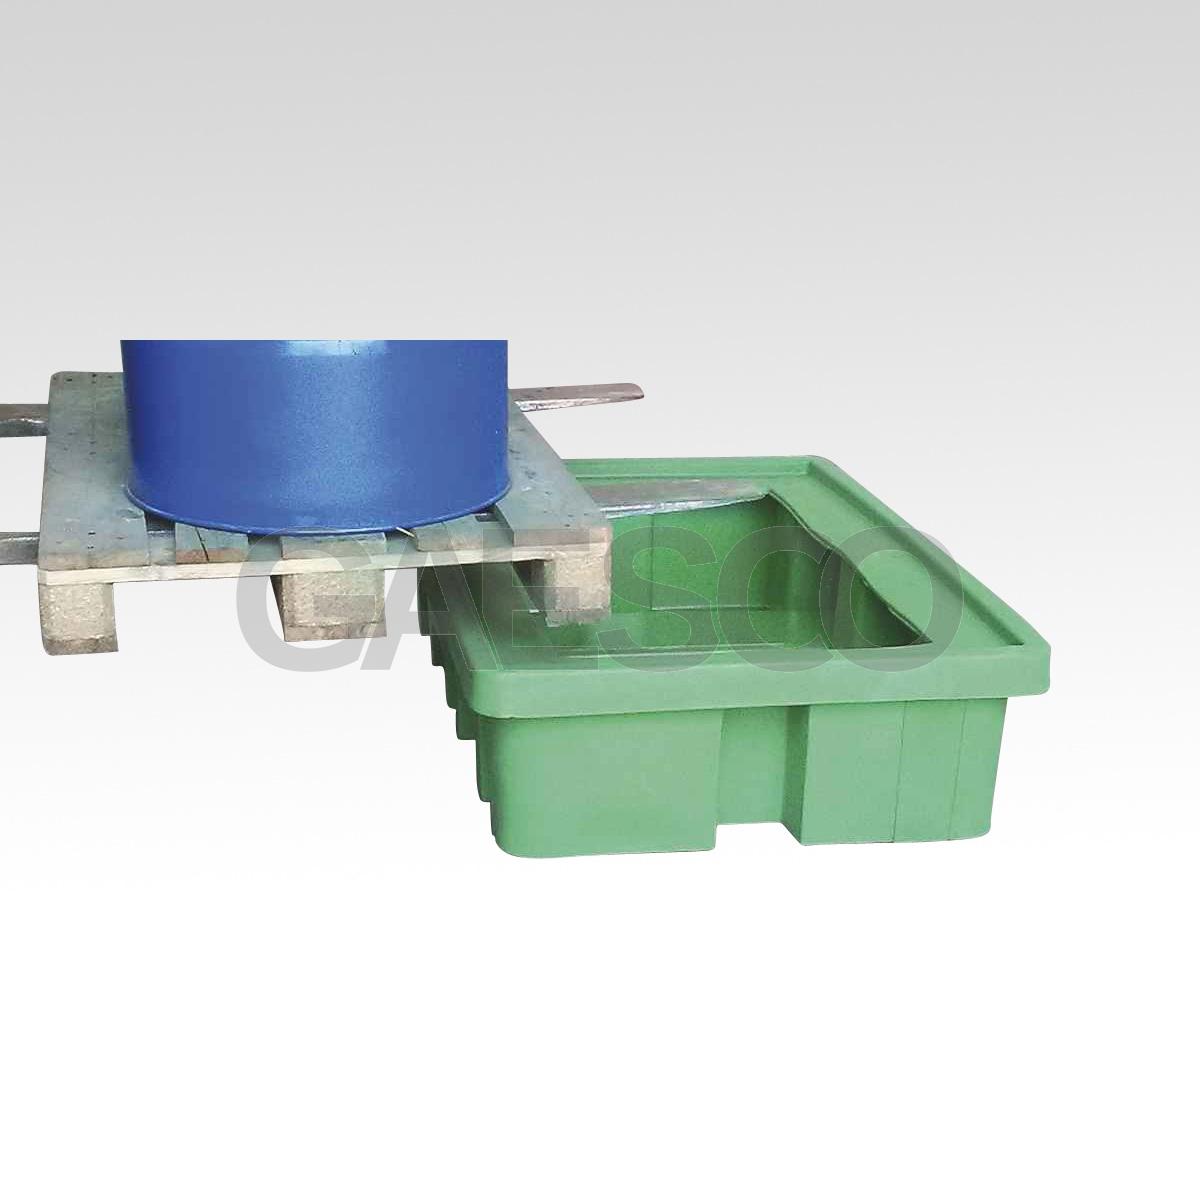 Vasca in plastica per 2 fusti 210 lt for Vasca in plastica per tartarughe